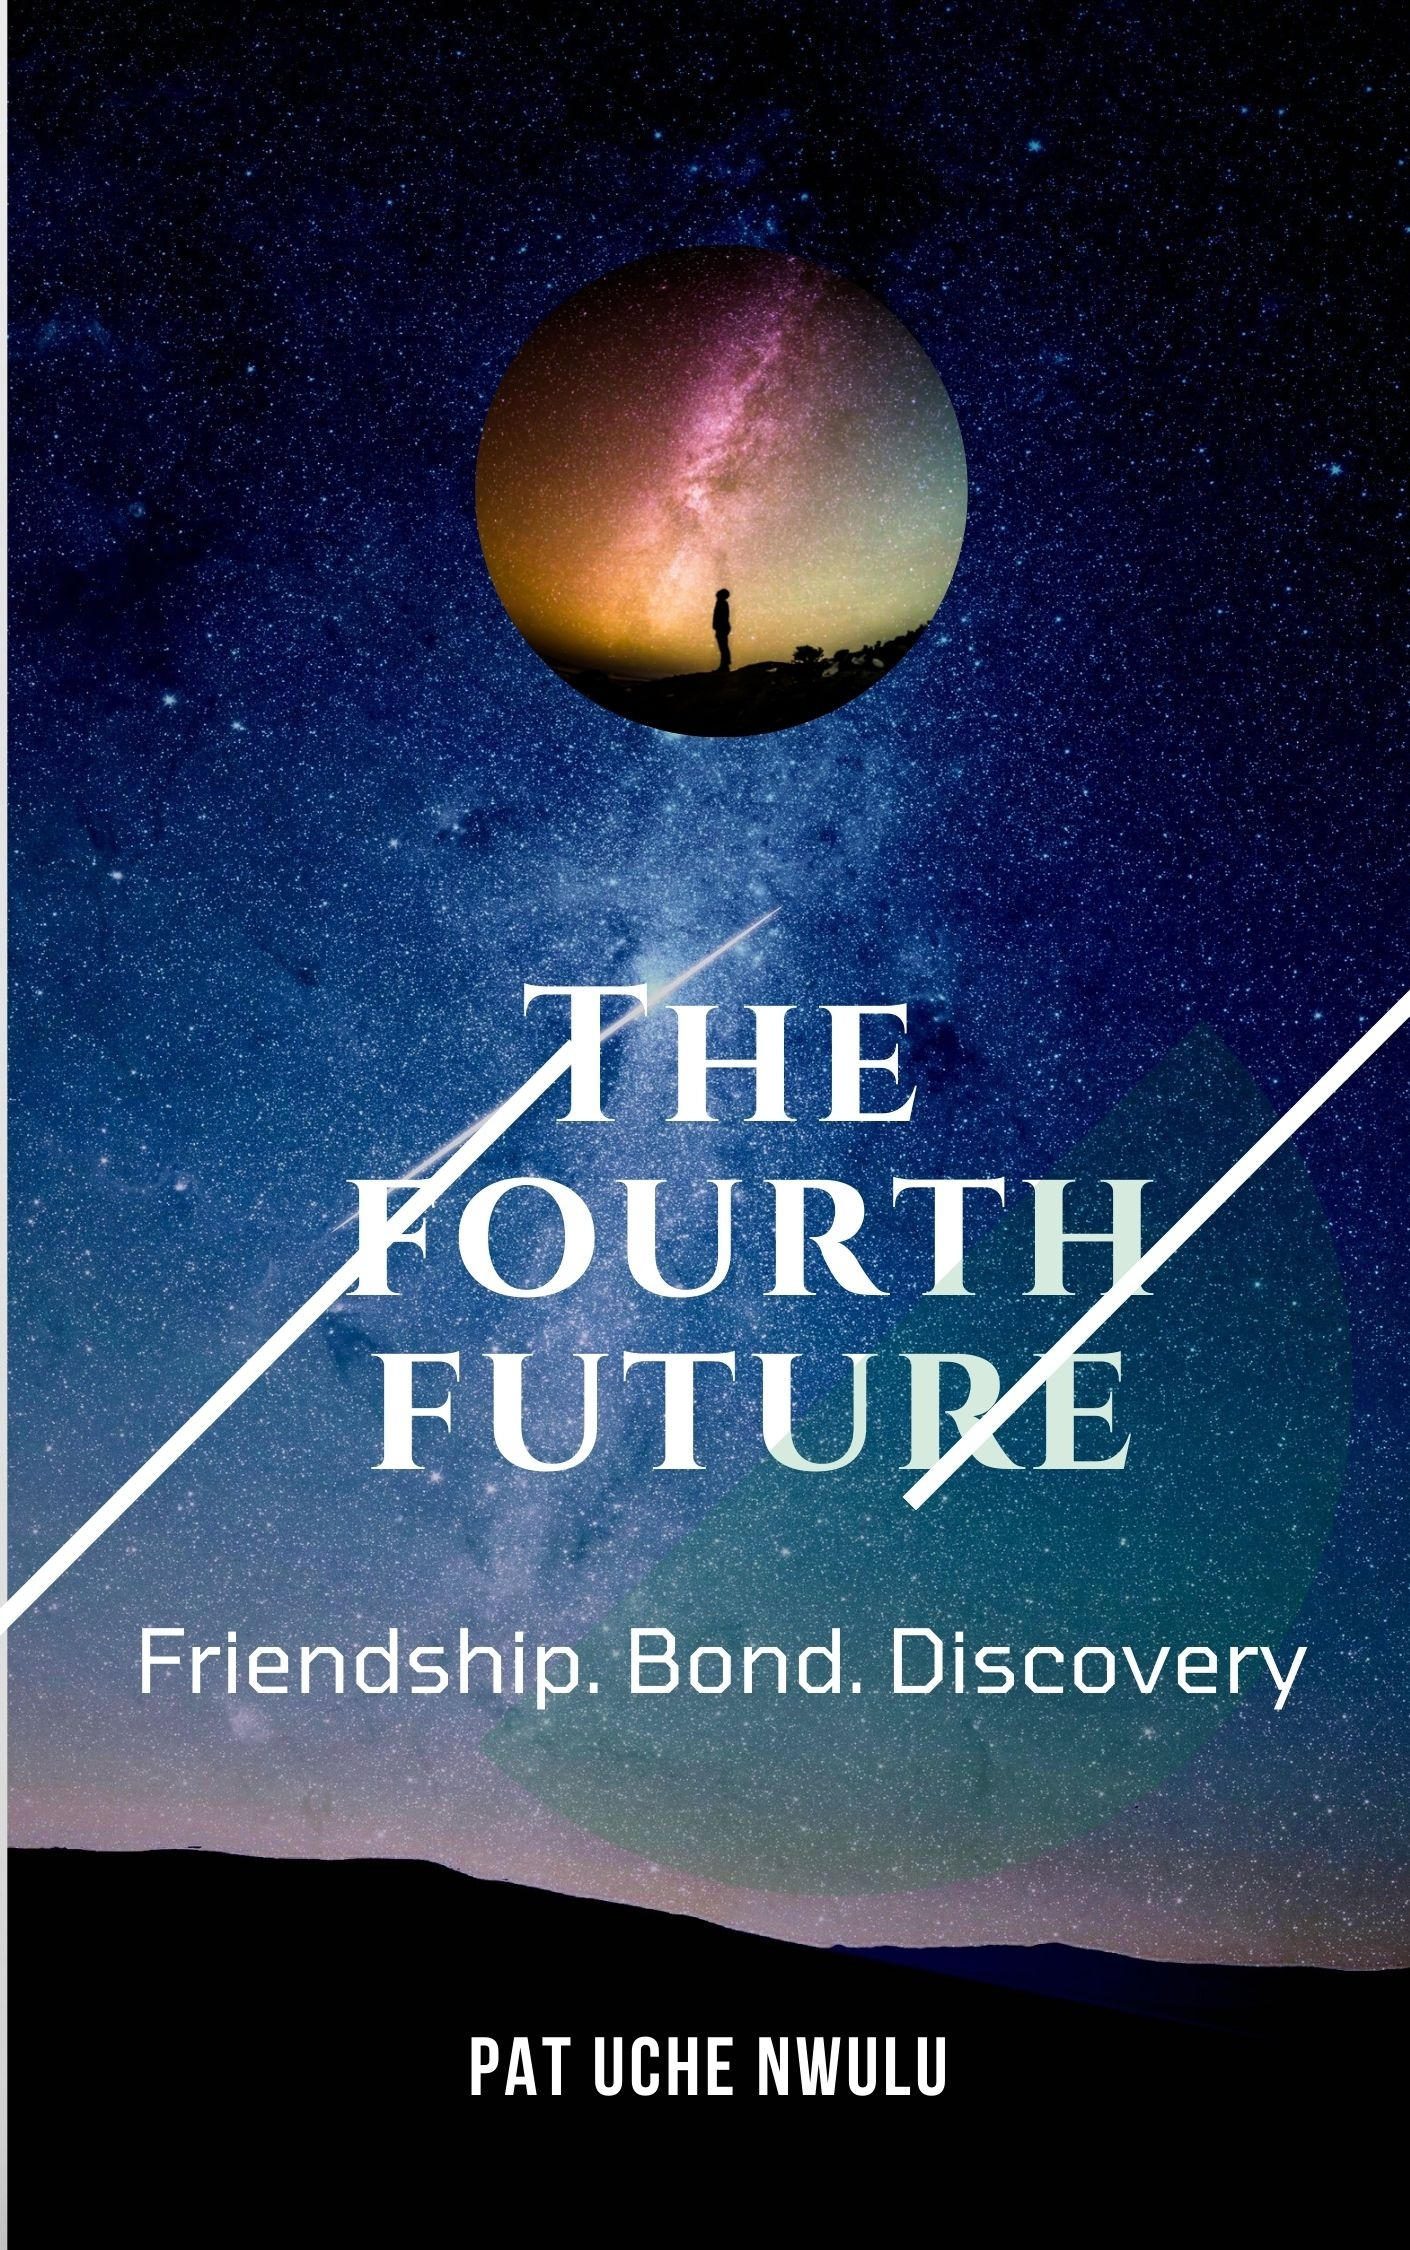 THE FOURTH FUTURE